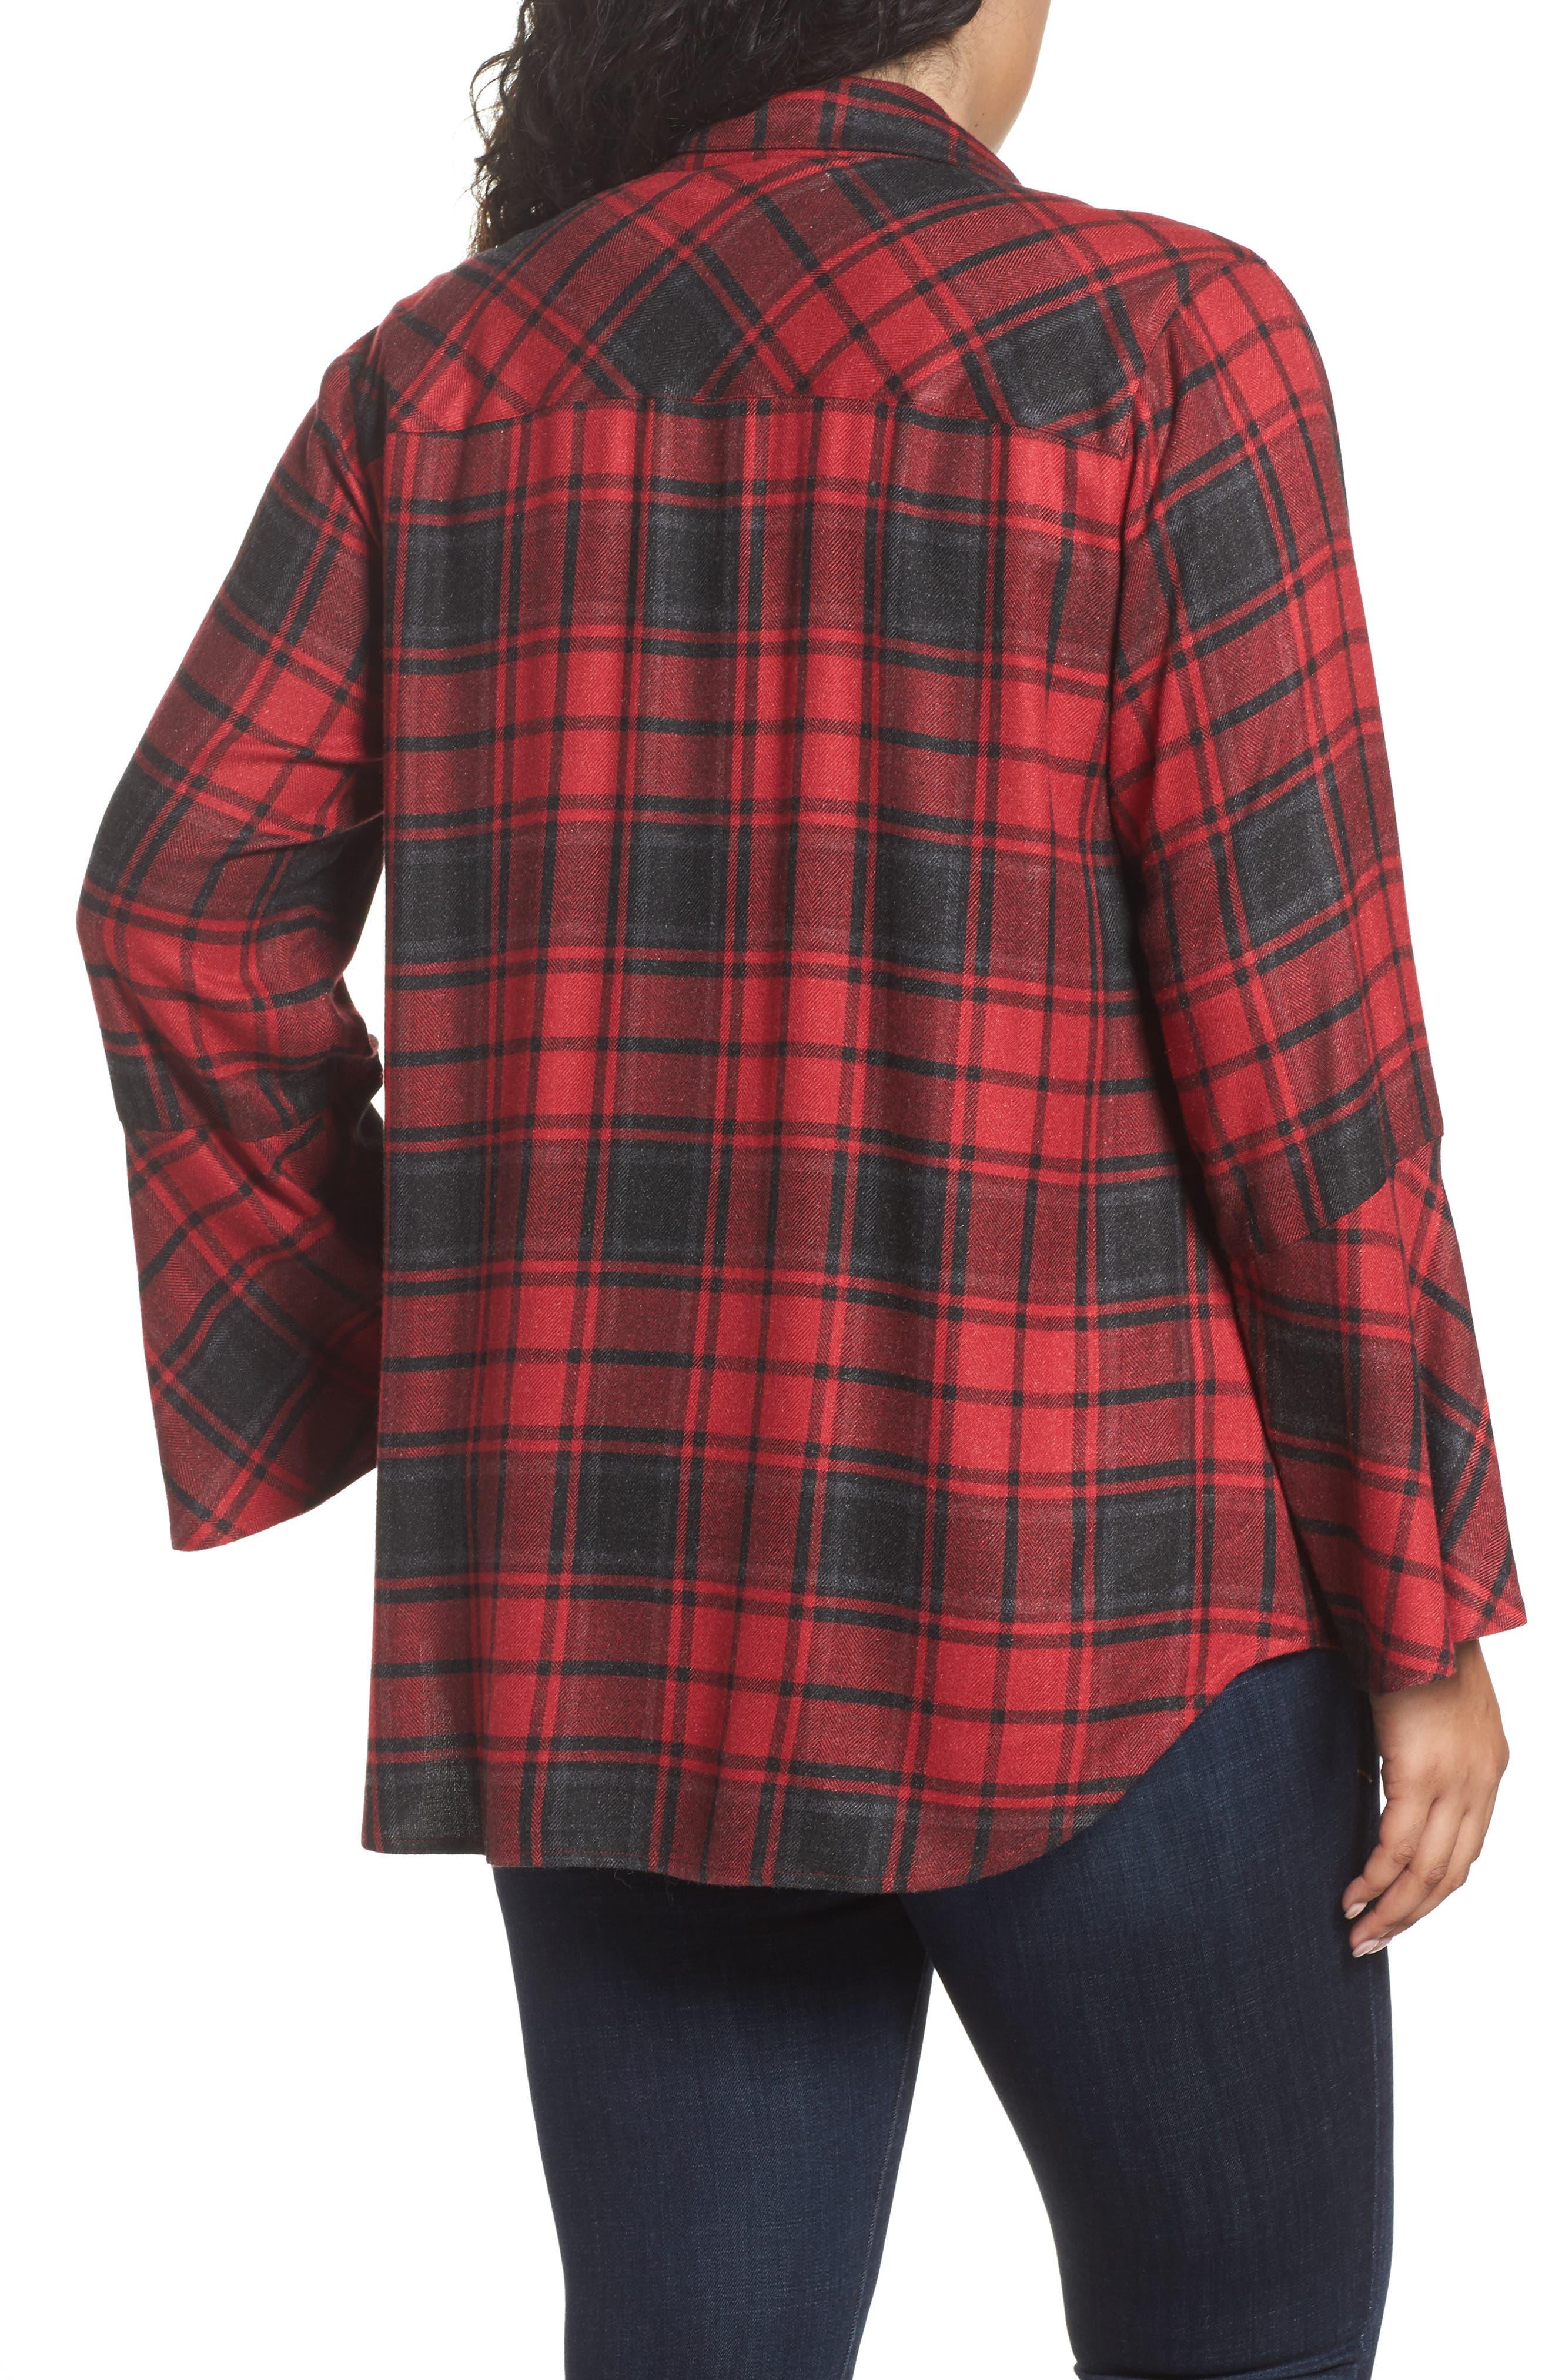 Stateside Bell Sleeve Shirt,                             Alternate thumbnail 2, color,                             Russet Red